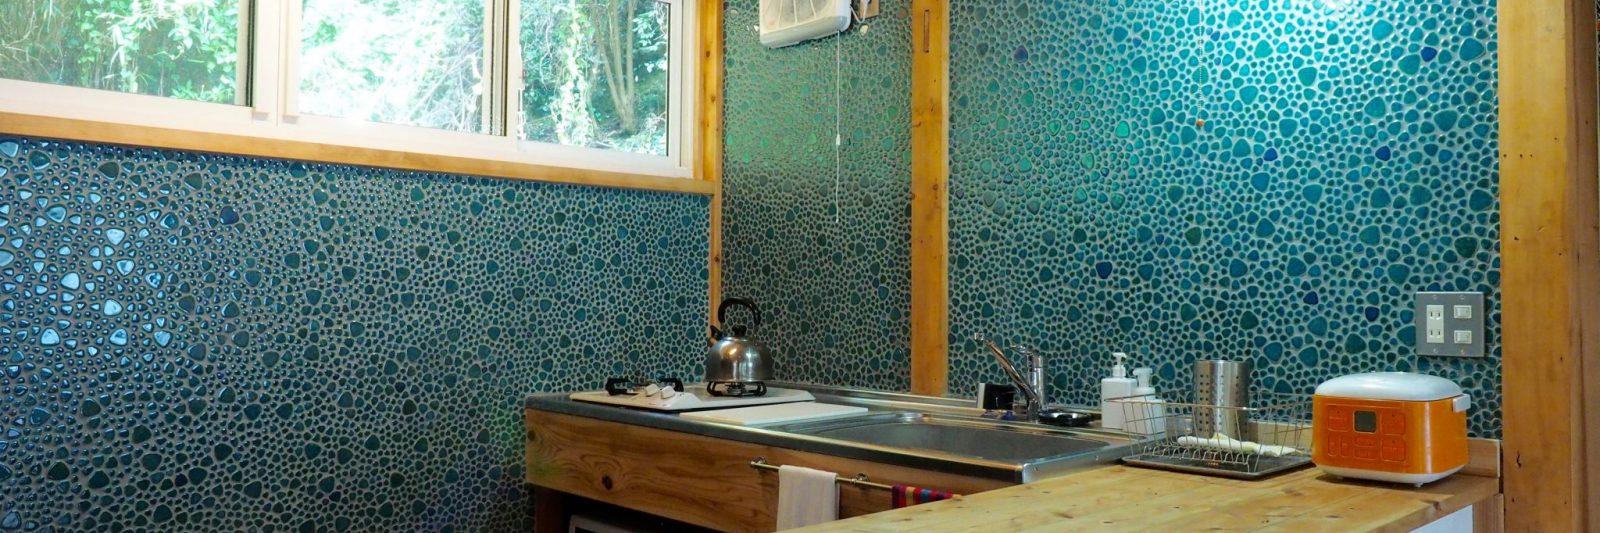 Oku Cottage Kitchen rental house shimoda